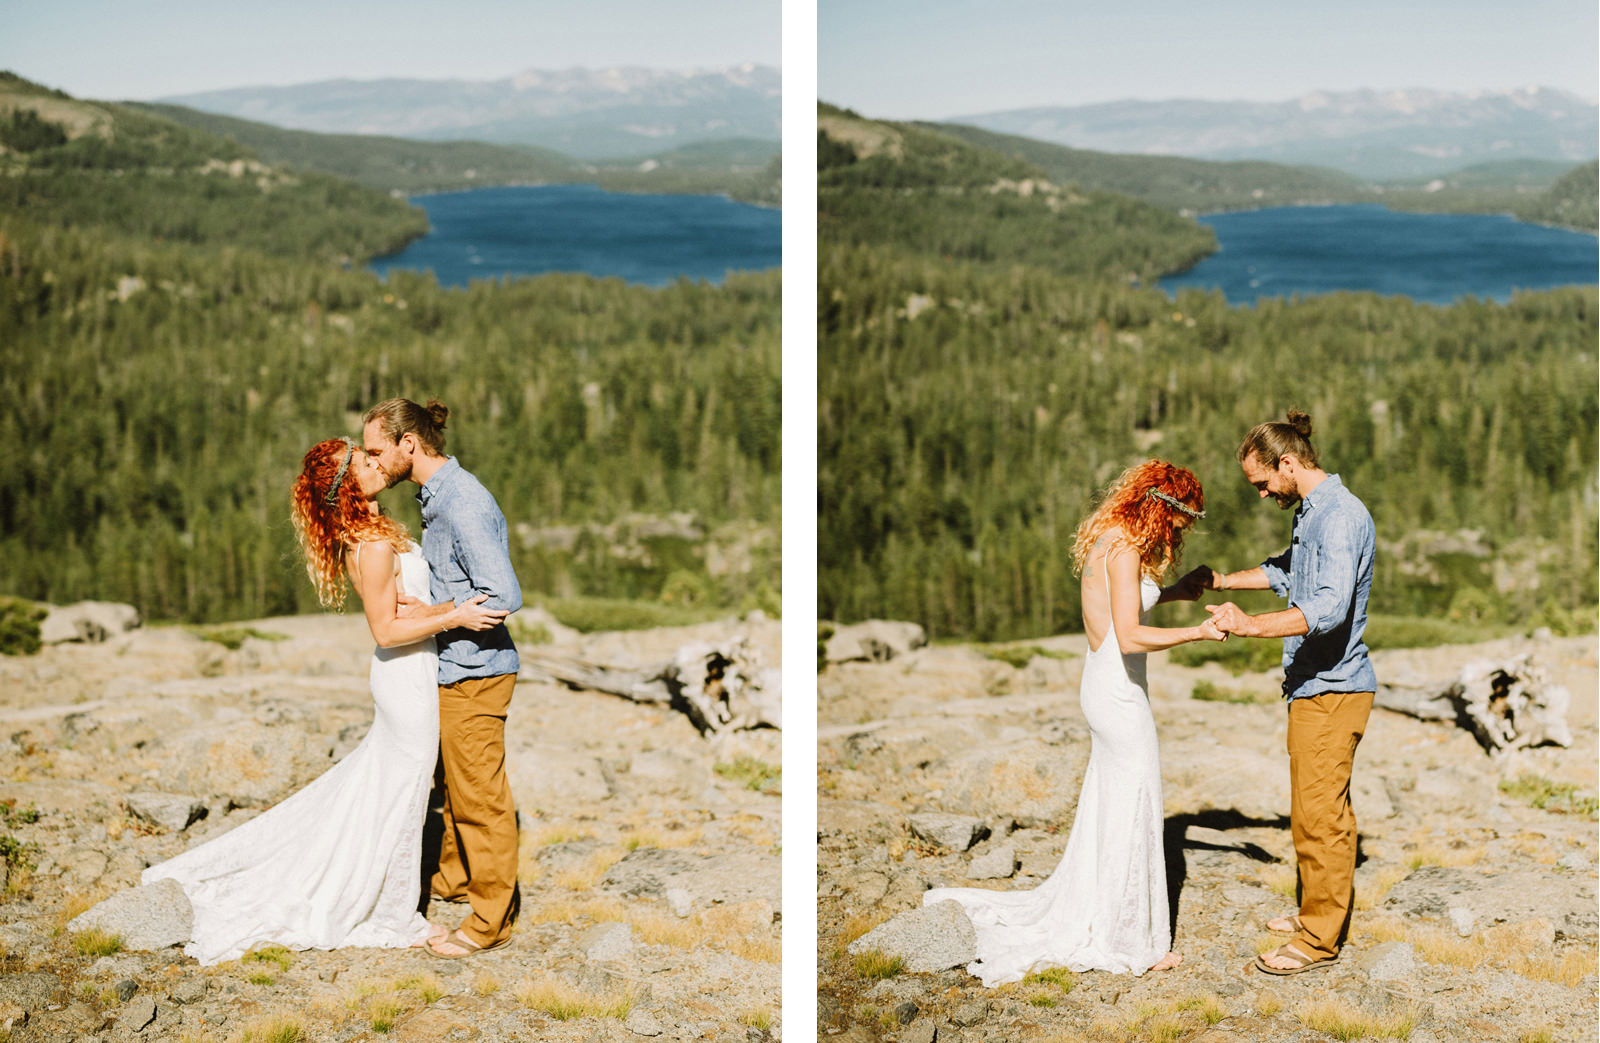 lake-tahoe-elopement-029 LAKE TAHOE ELOPEMENT